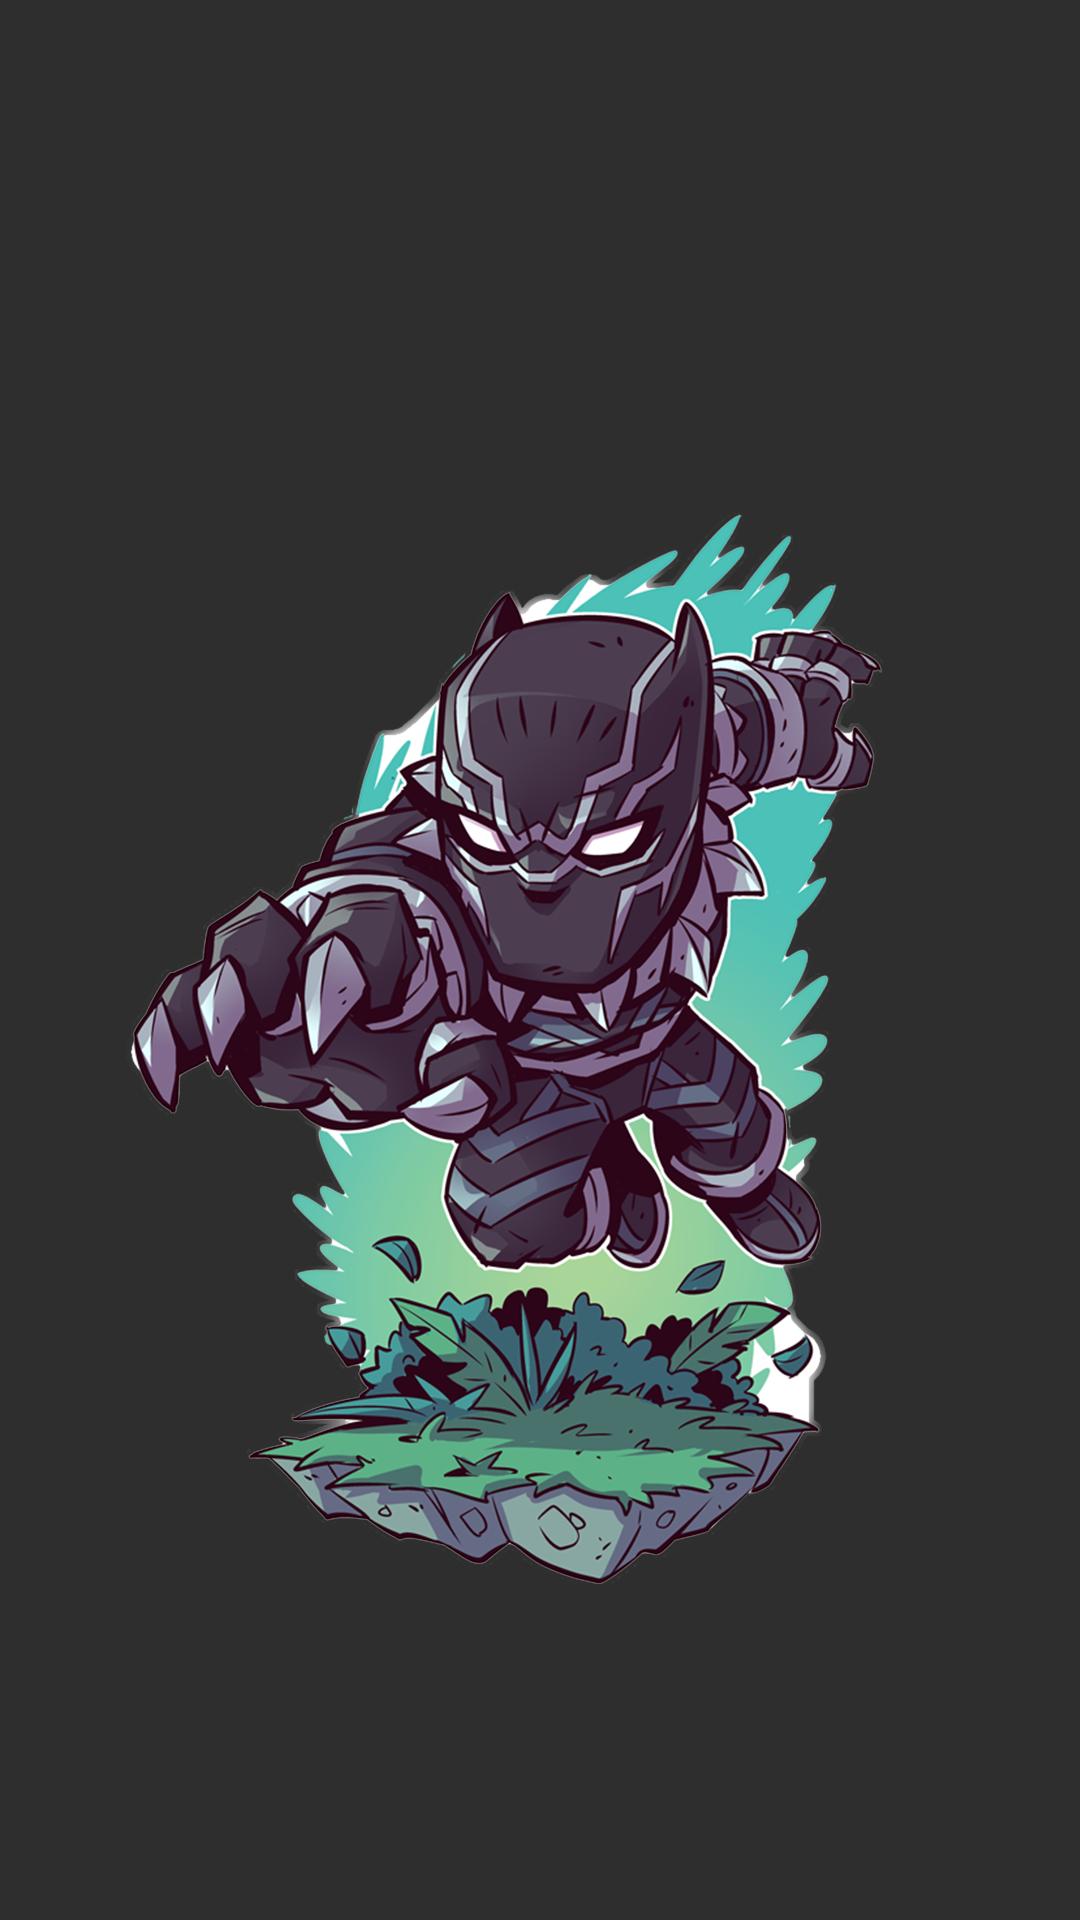 General 1080x1920 superhero Marvel Comics Black Panther